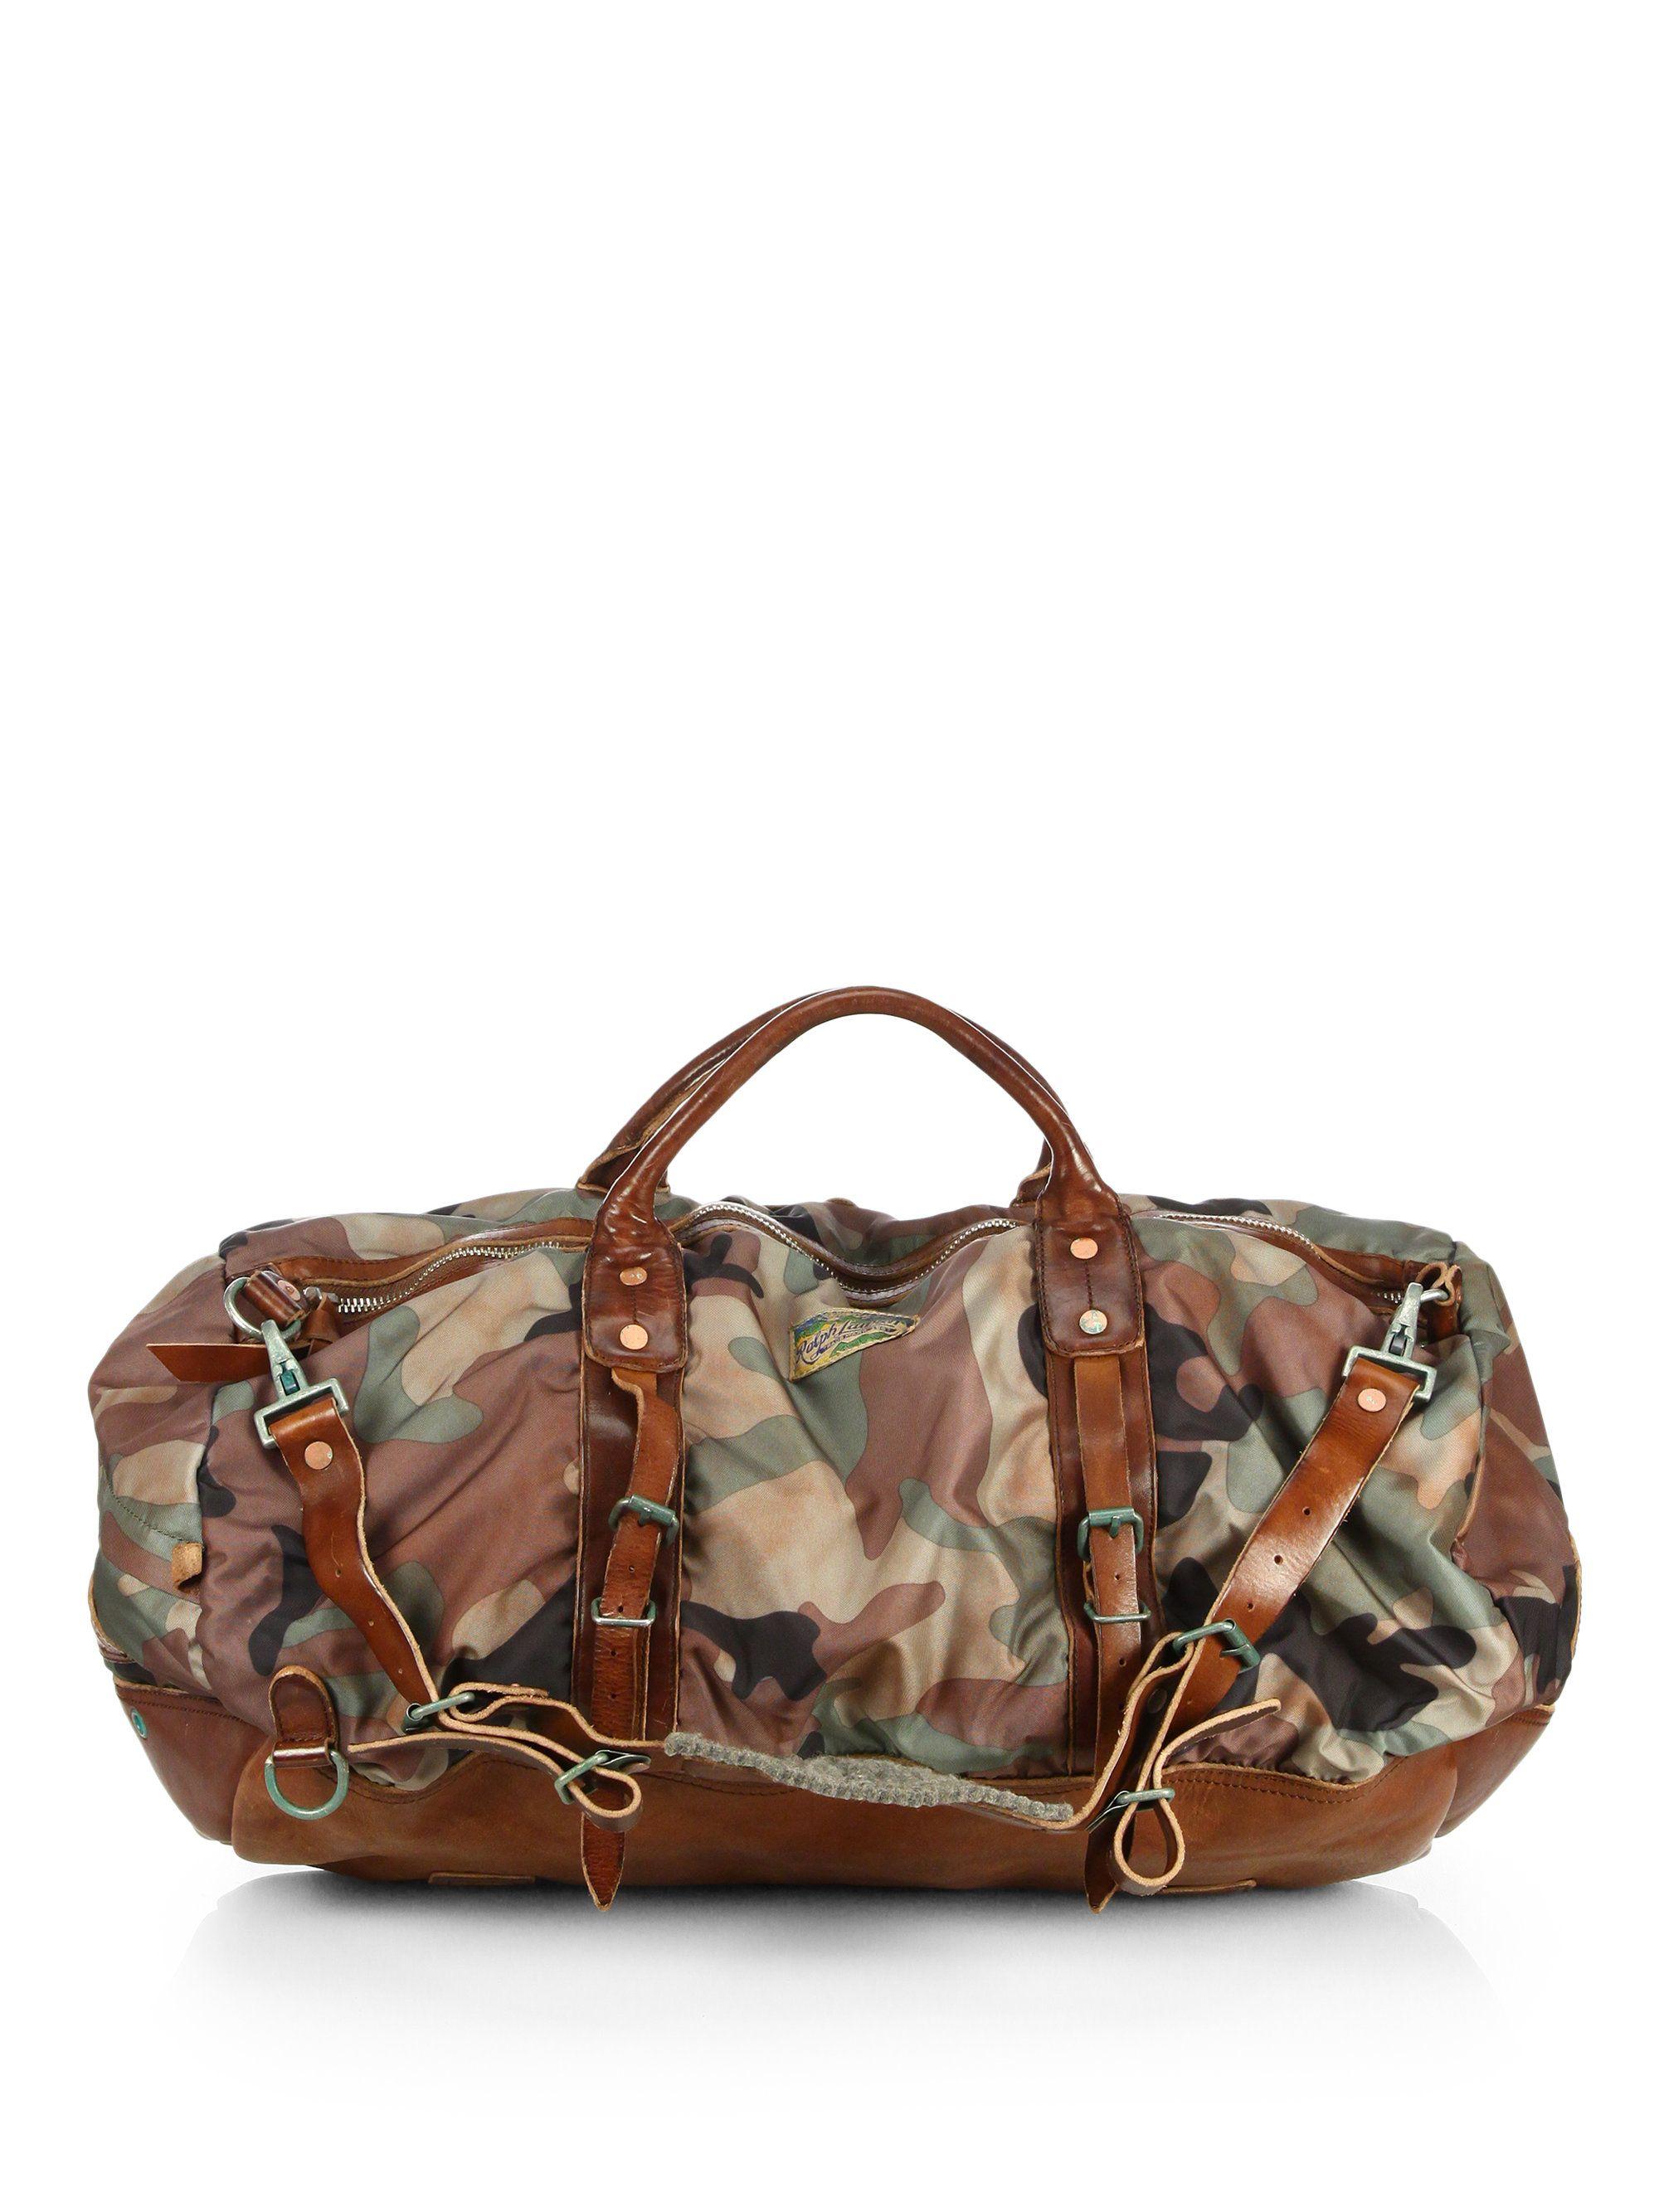 Polo ralph lauren Yosemite Nylon Duffel Bag in Green for Men ... 0656a86068